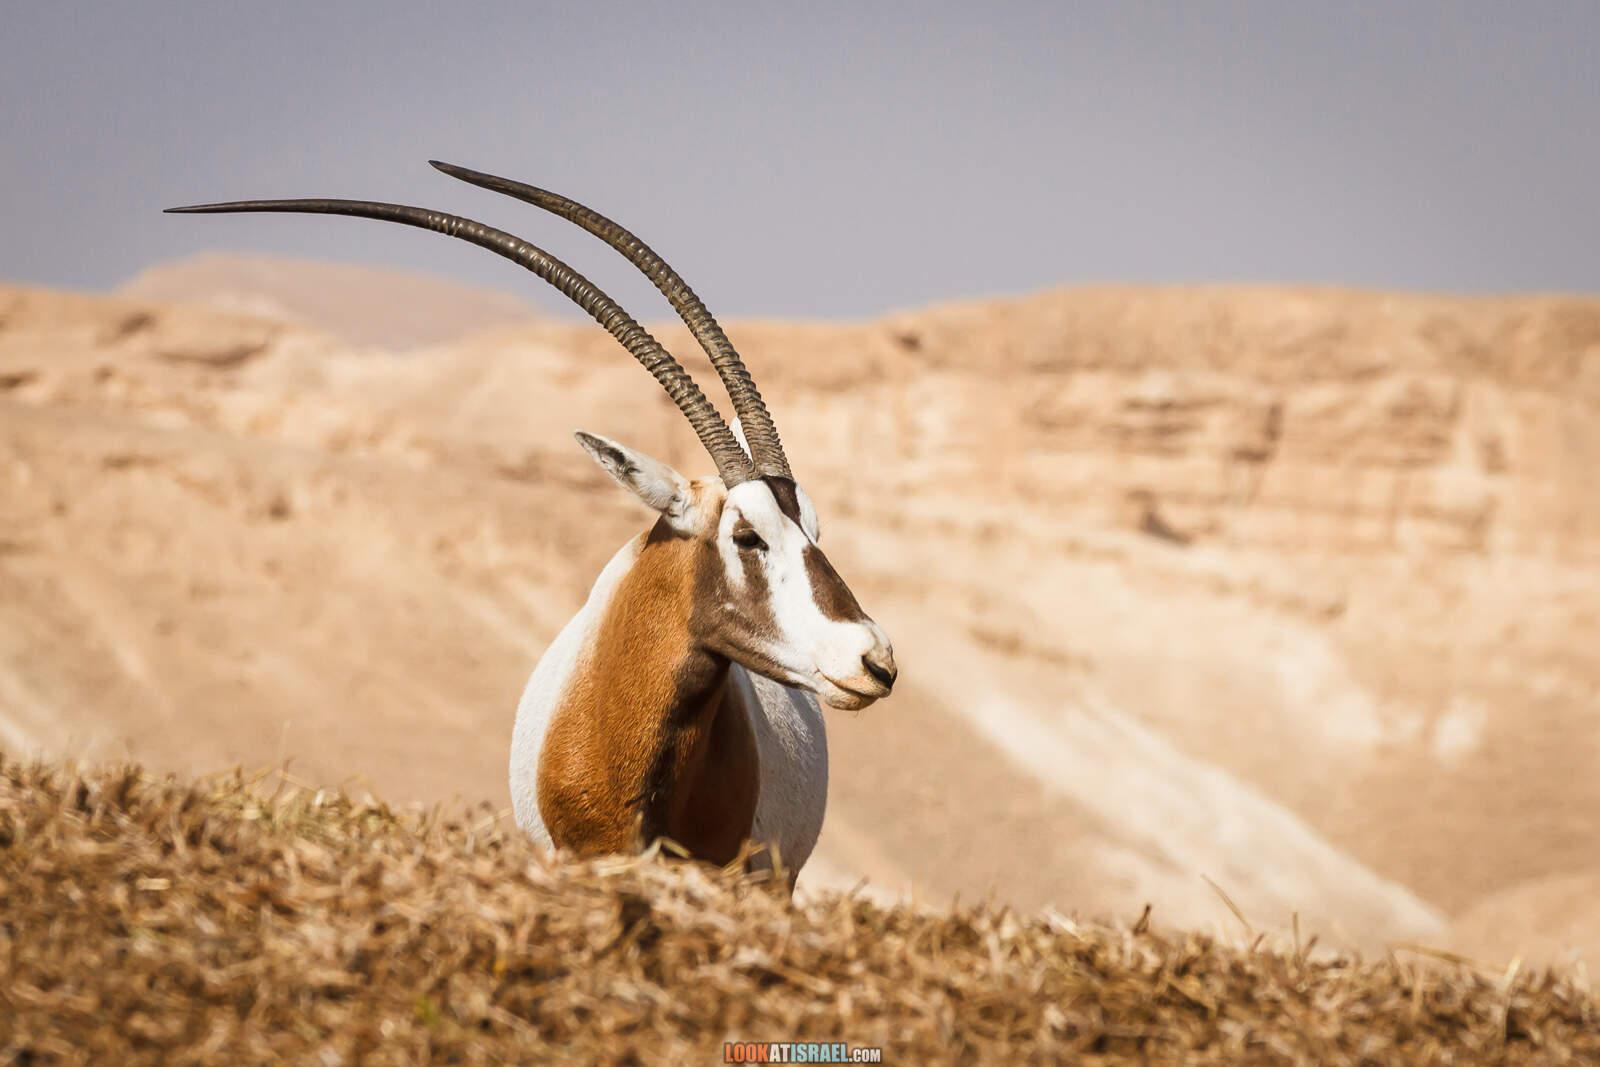 Африка в Израиле - Ферма ранчо антилоп в Араве | Antilope ranch in Arava | חוות האנטיליפות בערבה